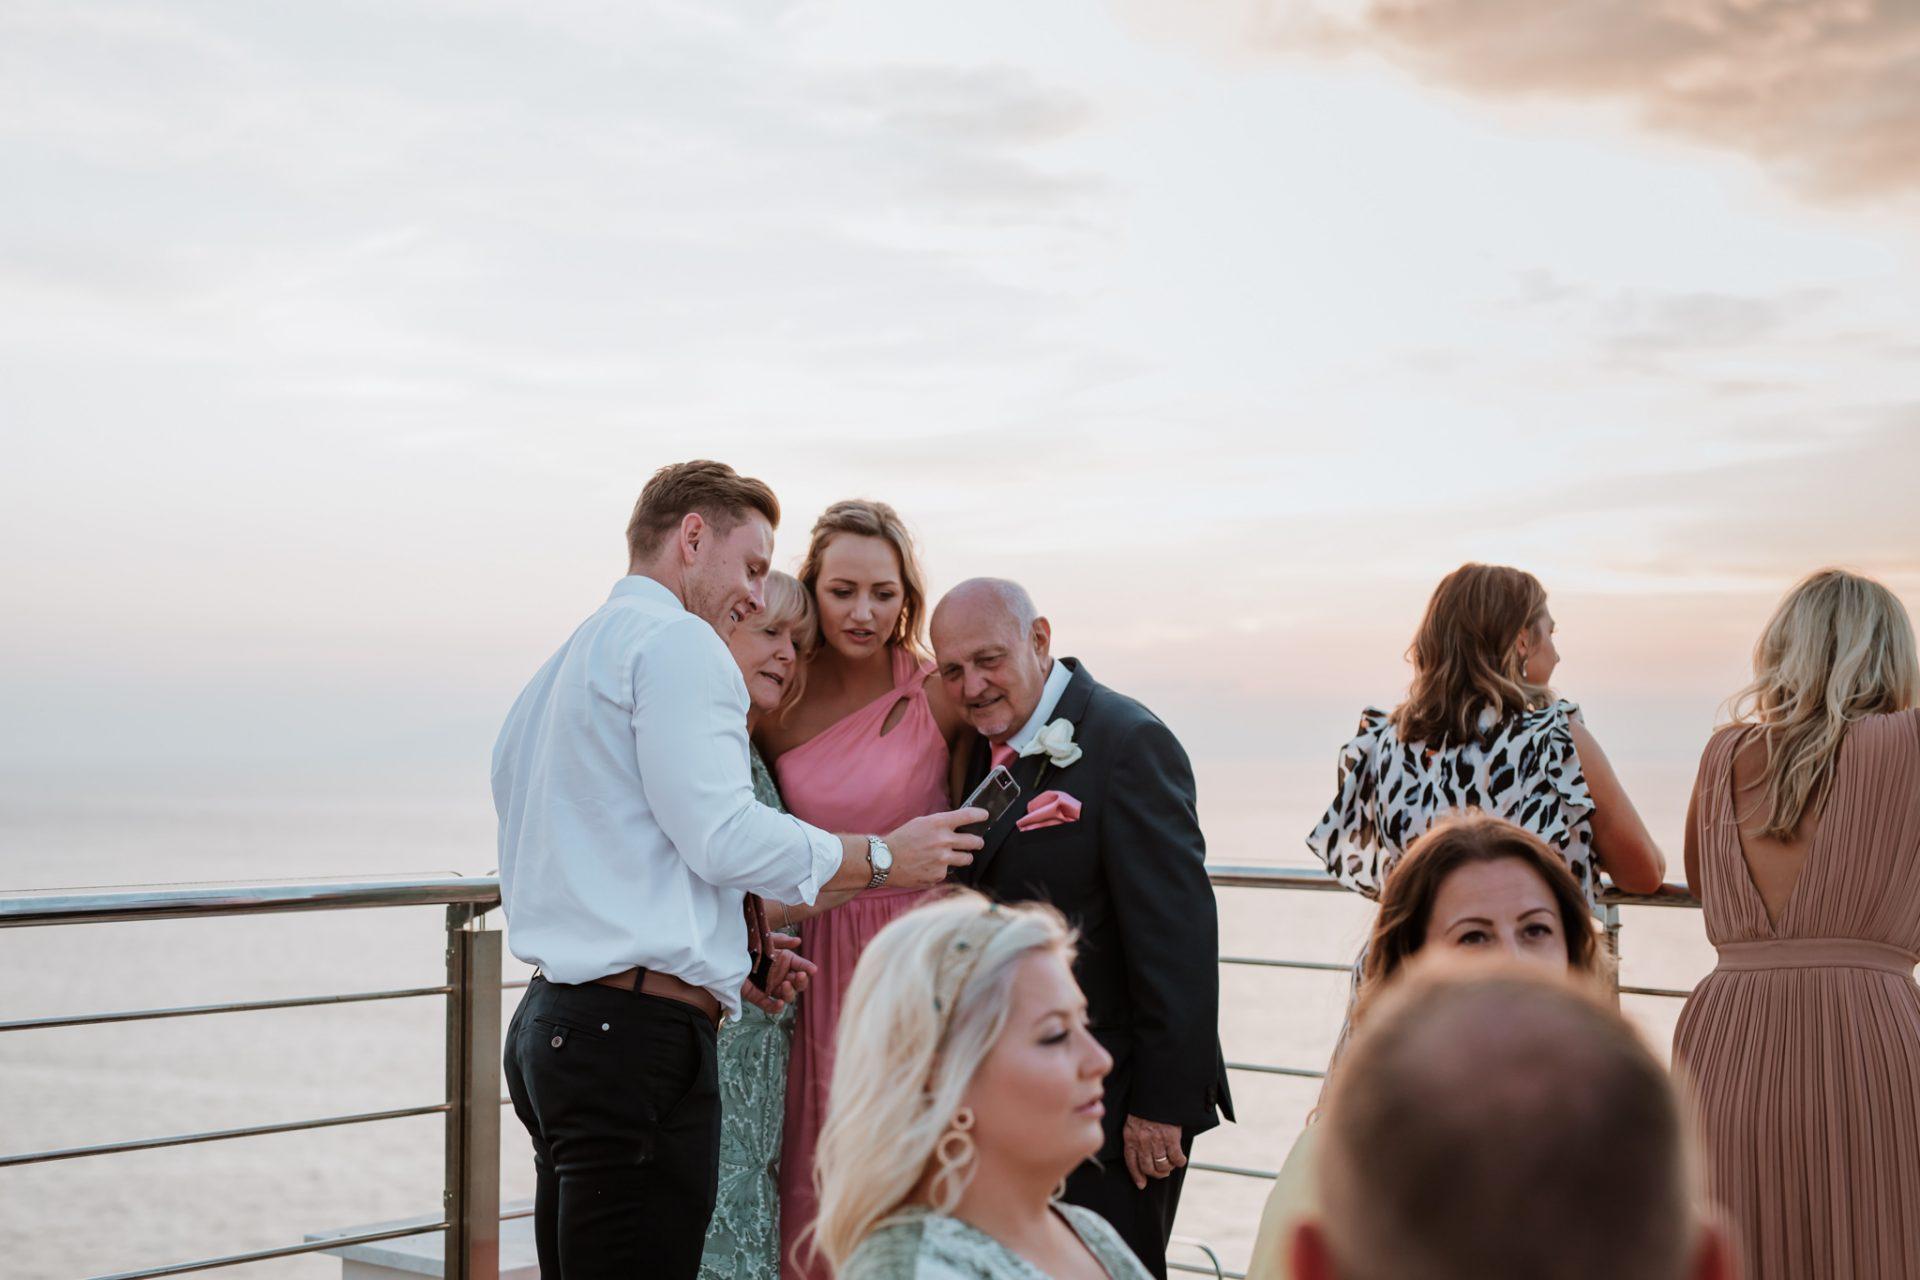 wedding guests candid photography hotel mediterraneo sorrento